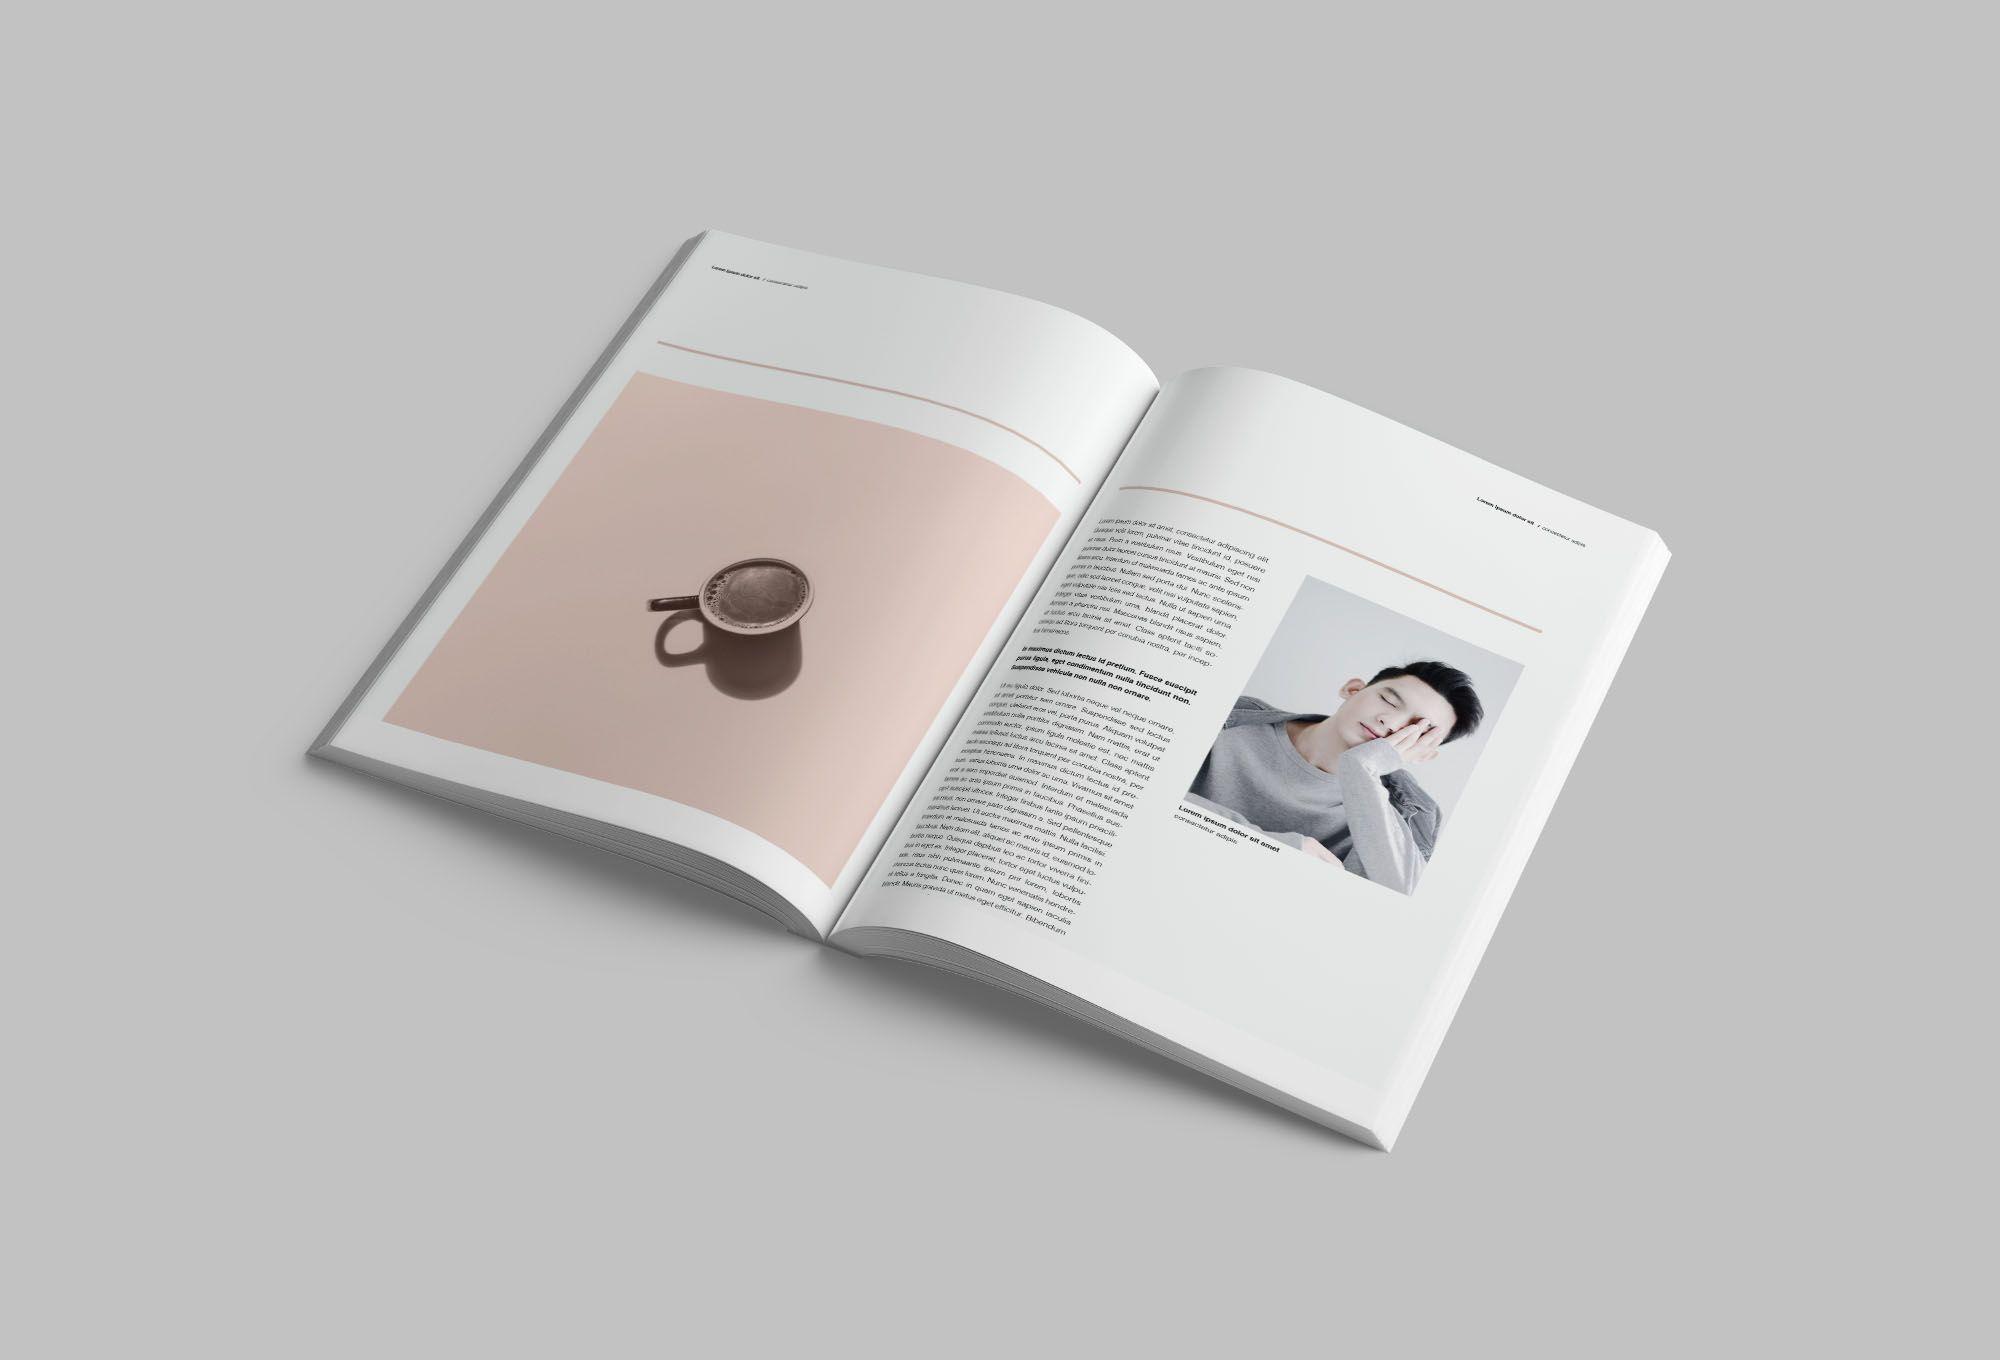 Softcover Book Mockup Mockup Free Psd Book Cover Mockup Free Book Cover Mockup